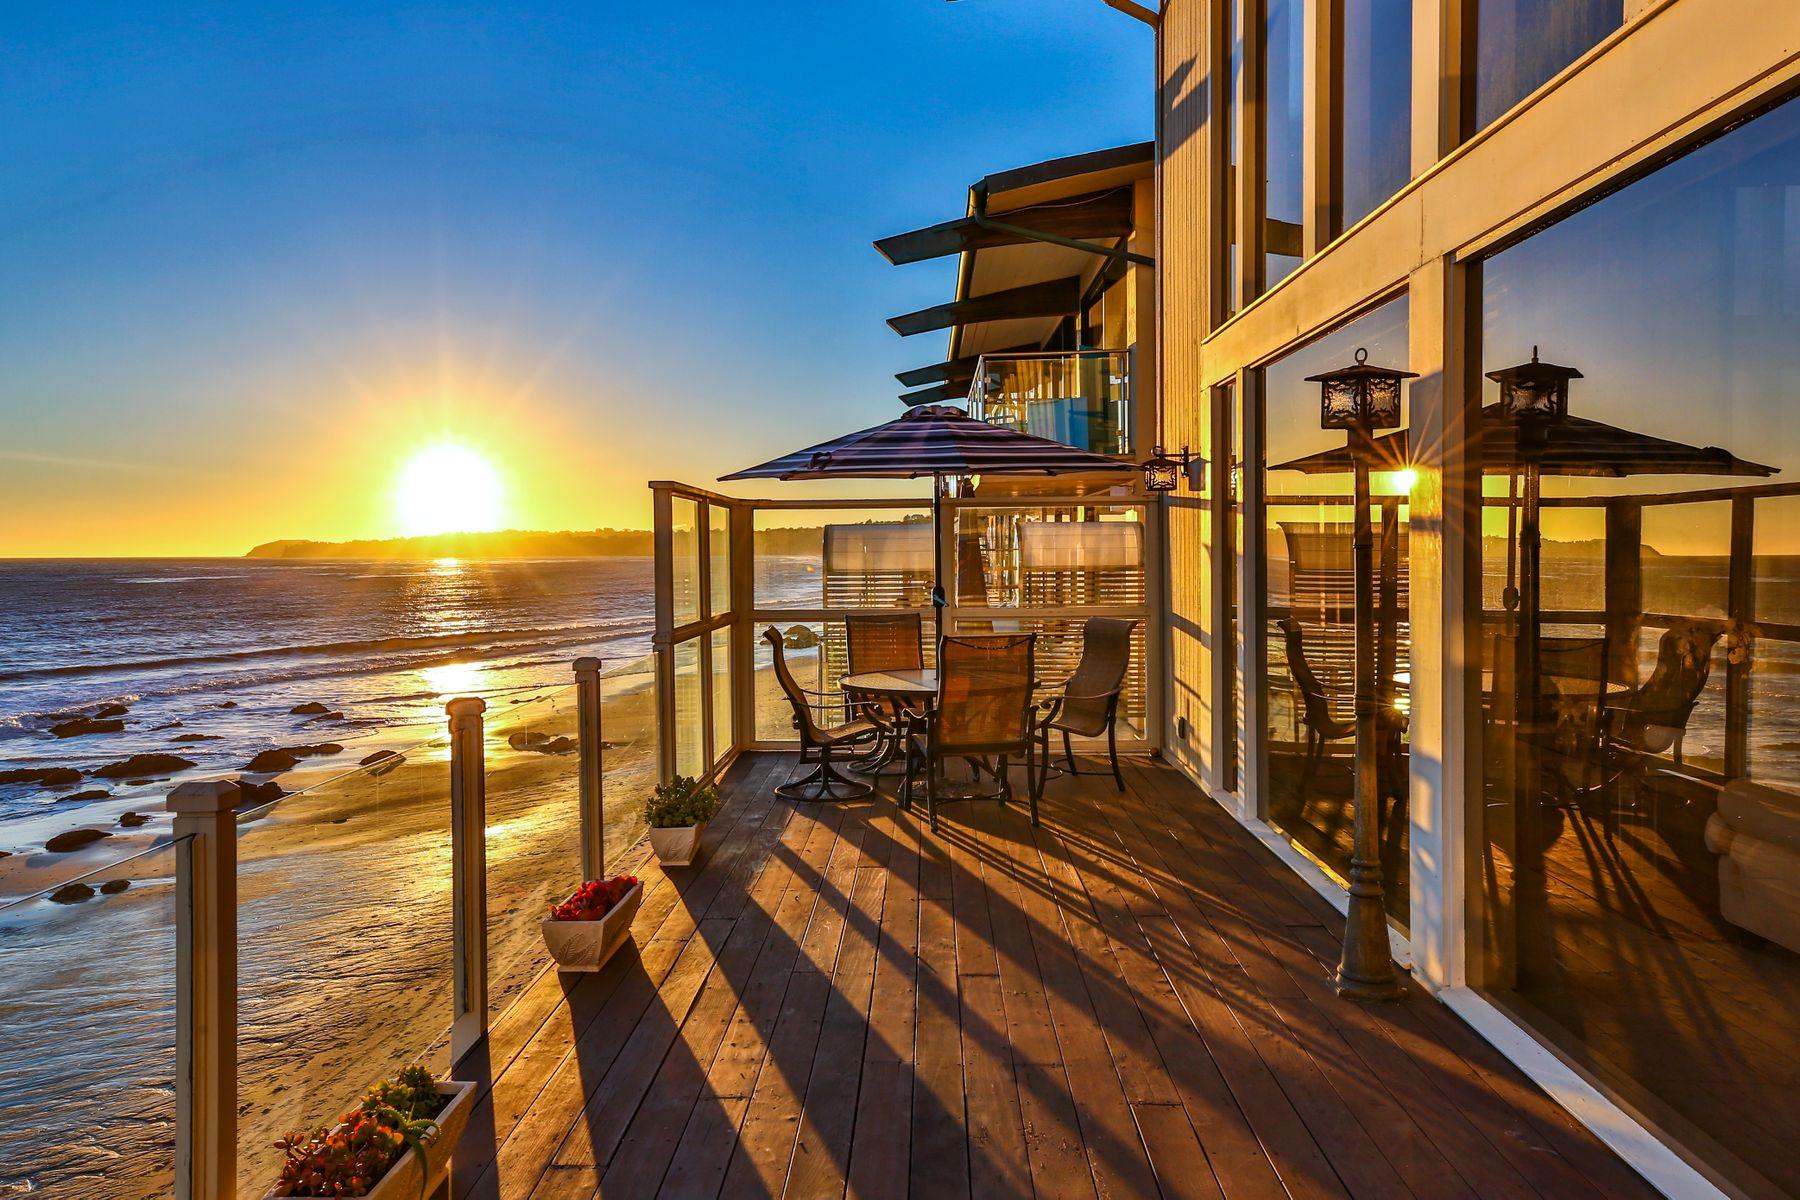 Single Family Homes for Sale at Brady Bunch Beach House 26962 Malibu Cove Colony Dr Malibu, California 90265 United States